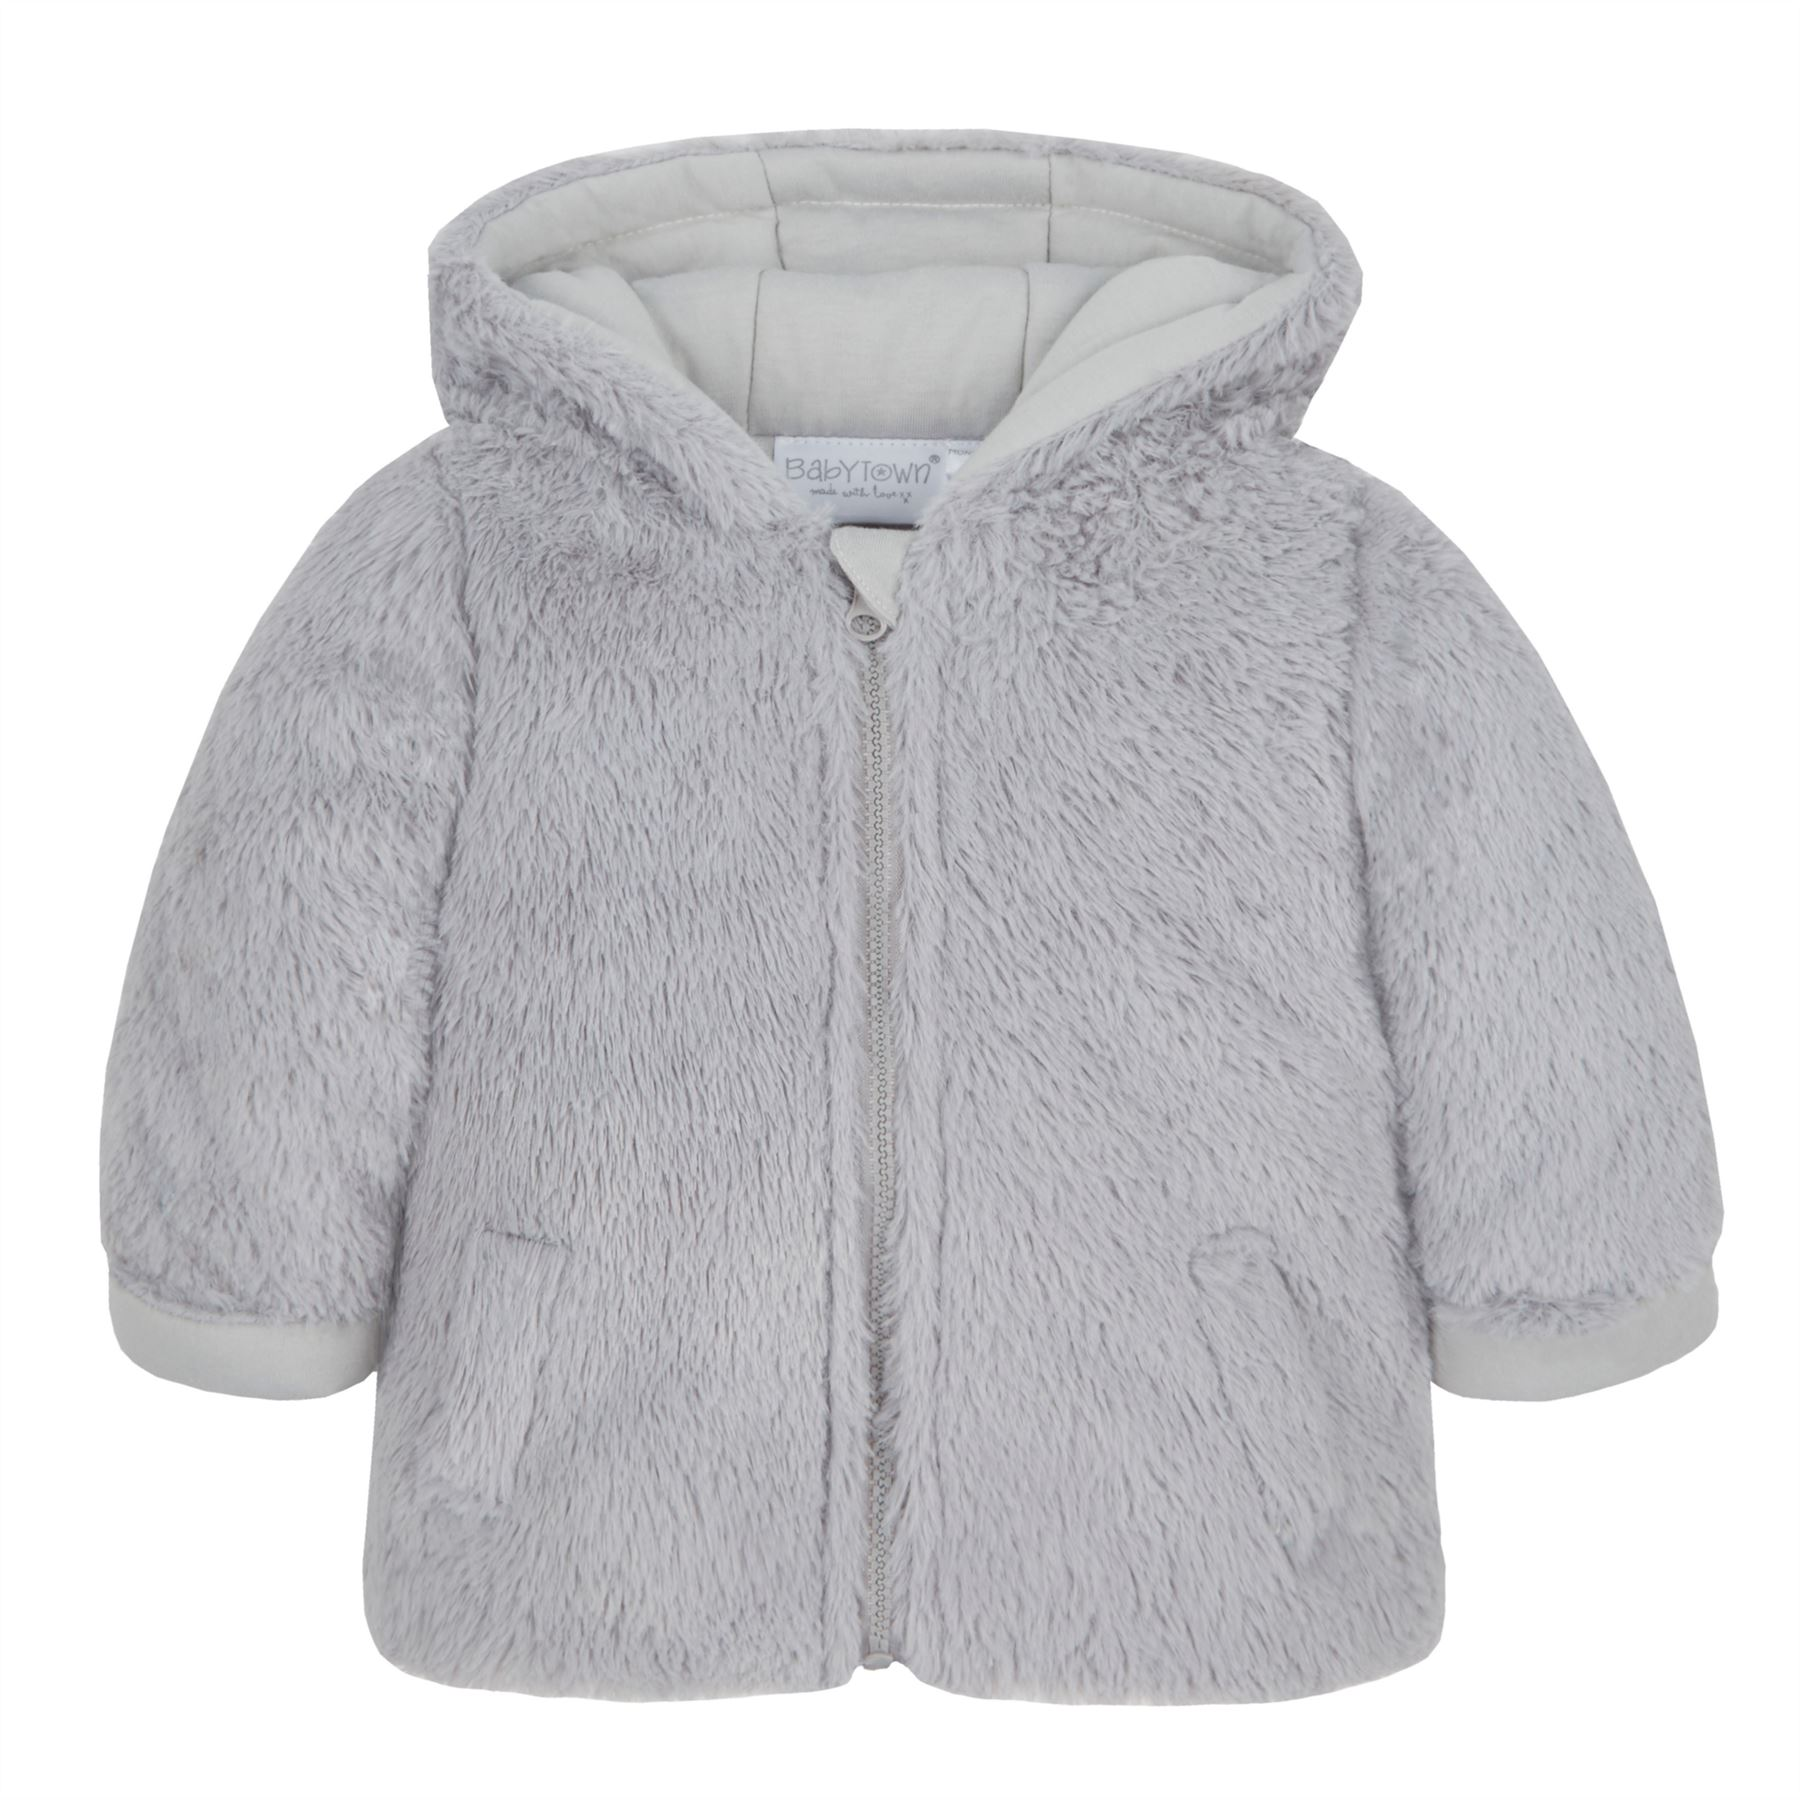 1e12d67ef Baby Girls Boys Faux Fur Coat Plush Fleece Jacket Winter Pramsuit ...